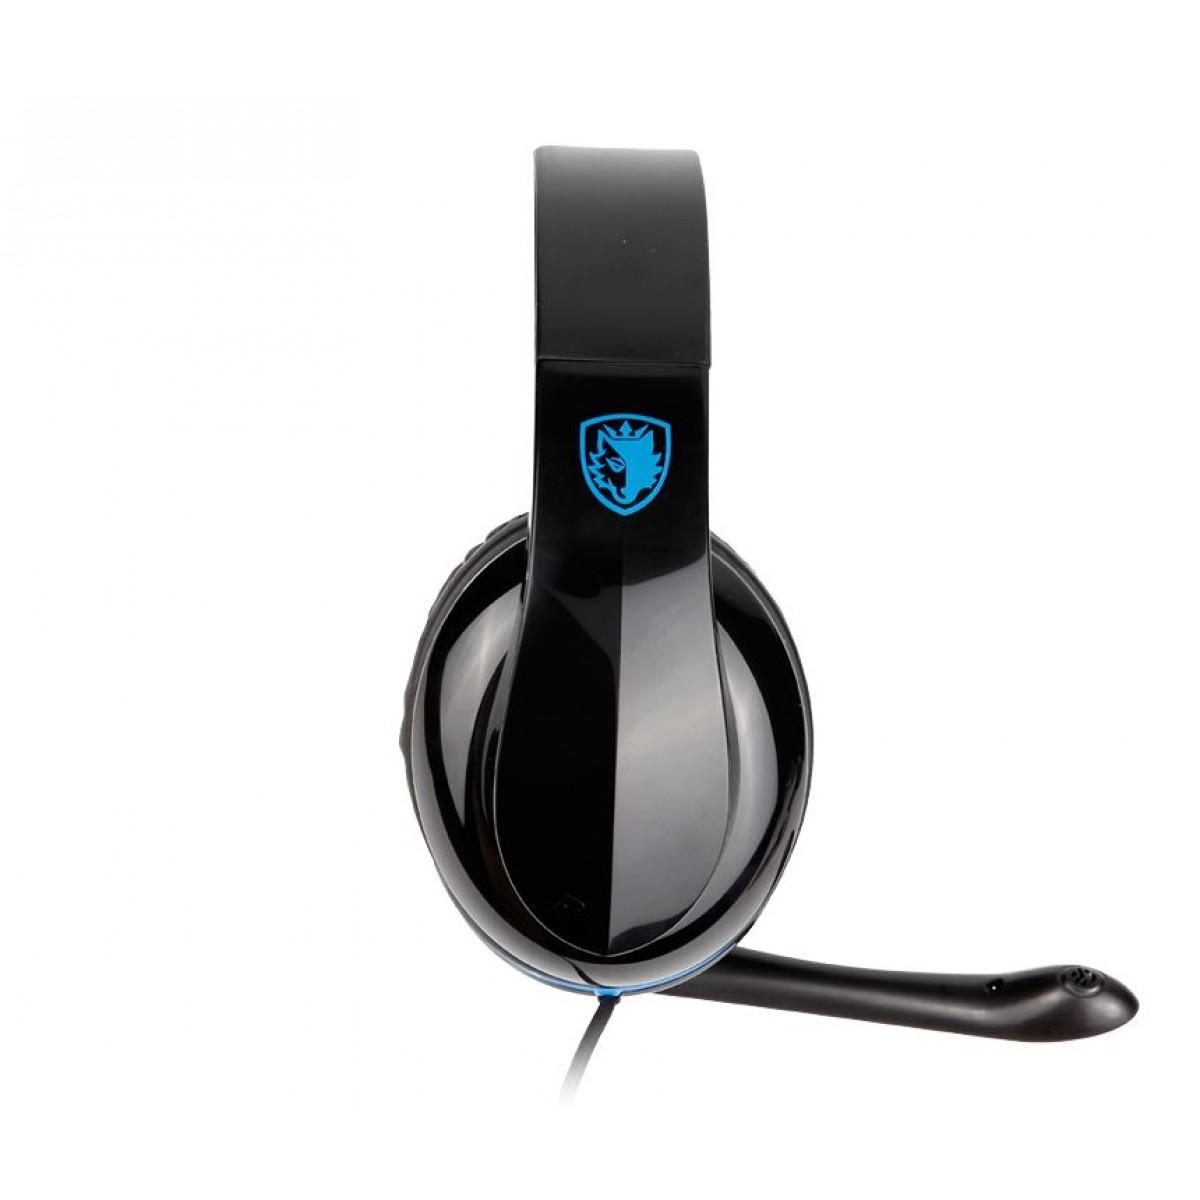 Headset Gamer Sades Sa-701 Tpower, Stereo, Black/Blue, SA-701